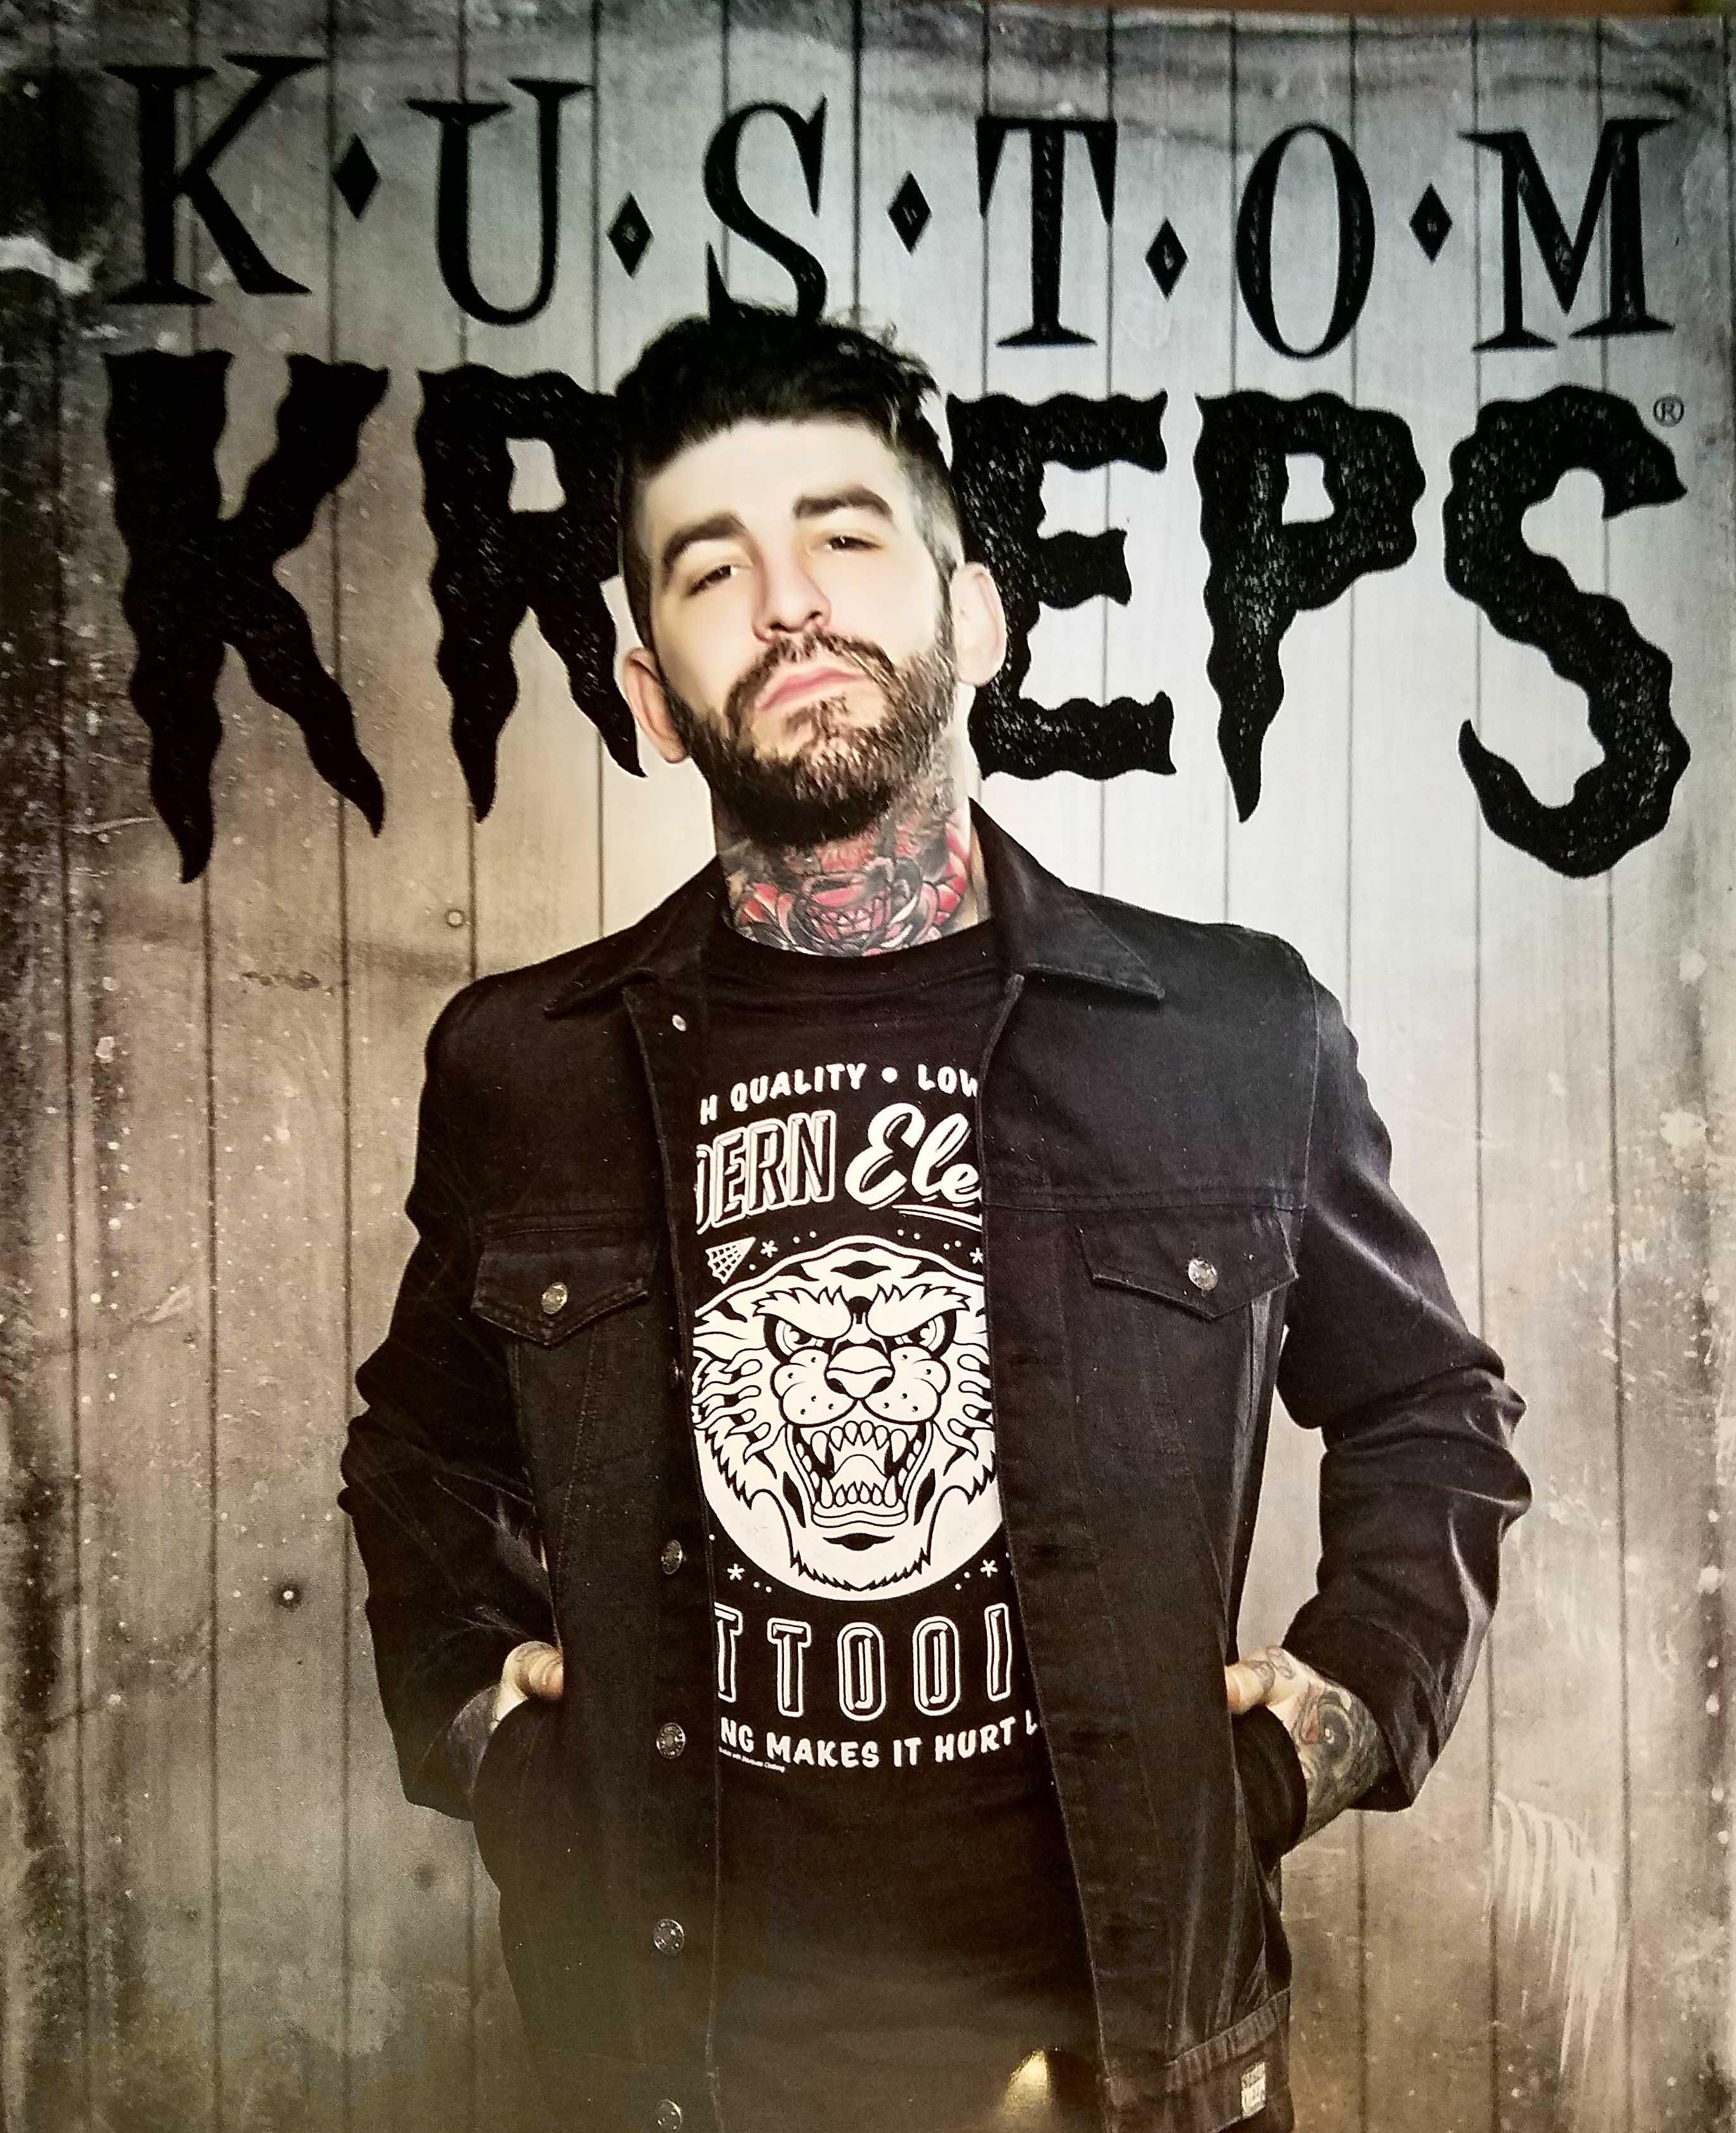 Black Denim Jacket by Kustom Kreeps / Sourpuss